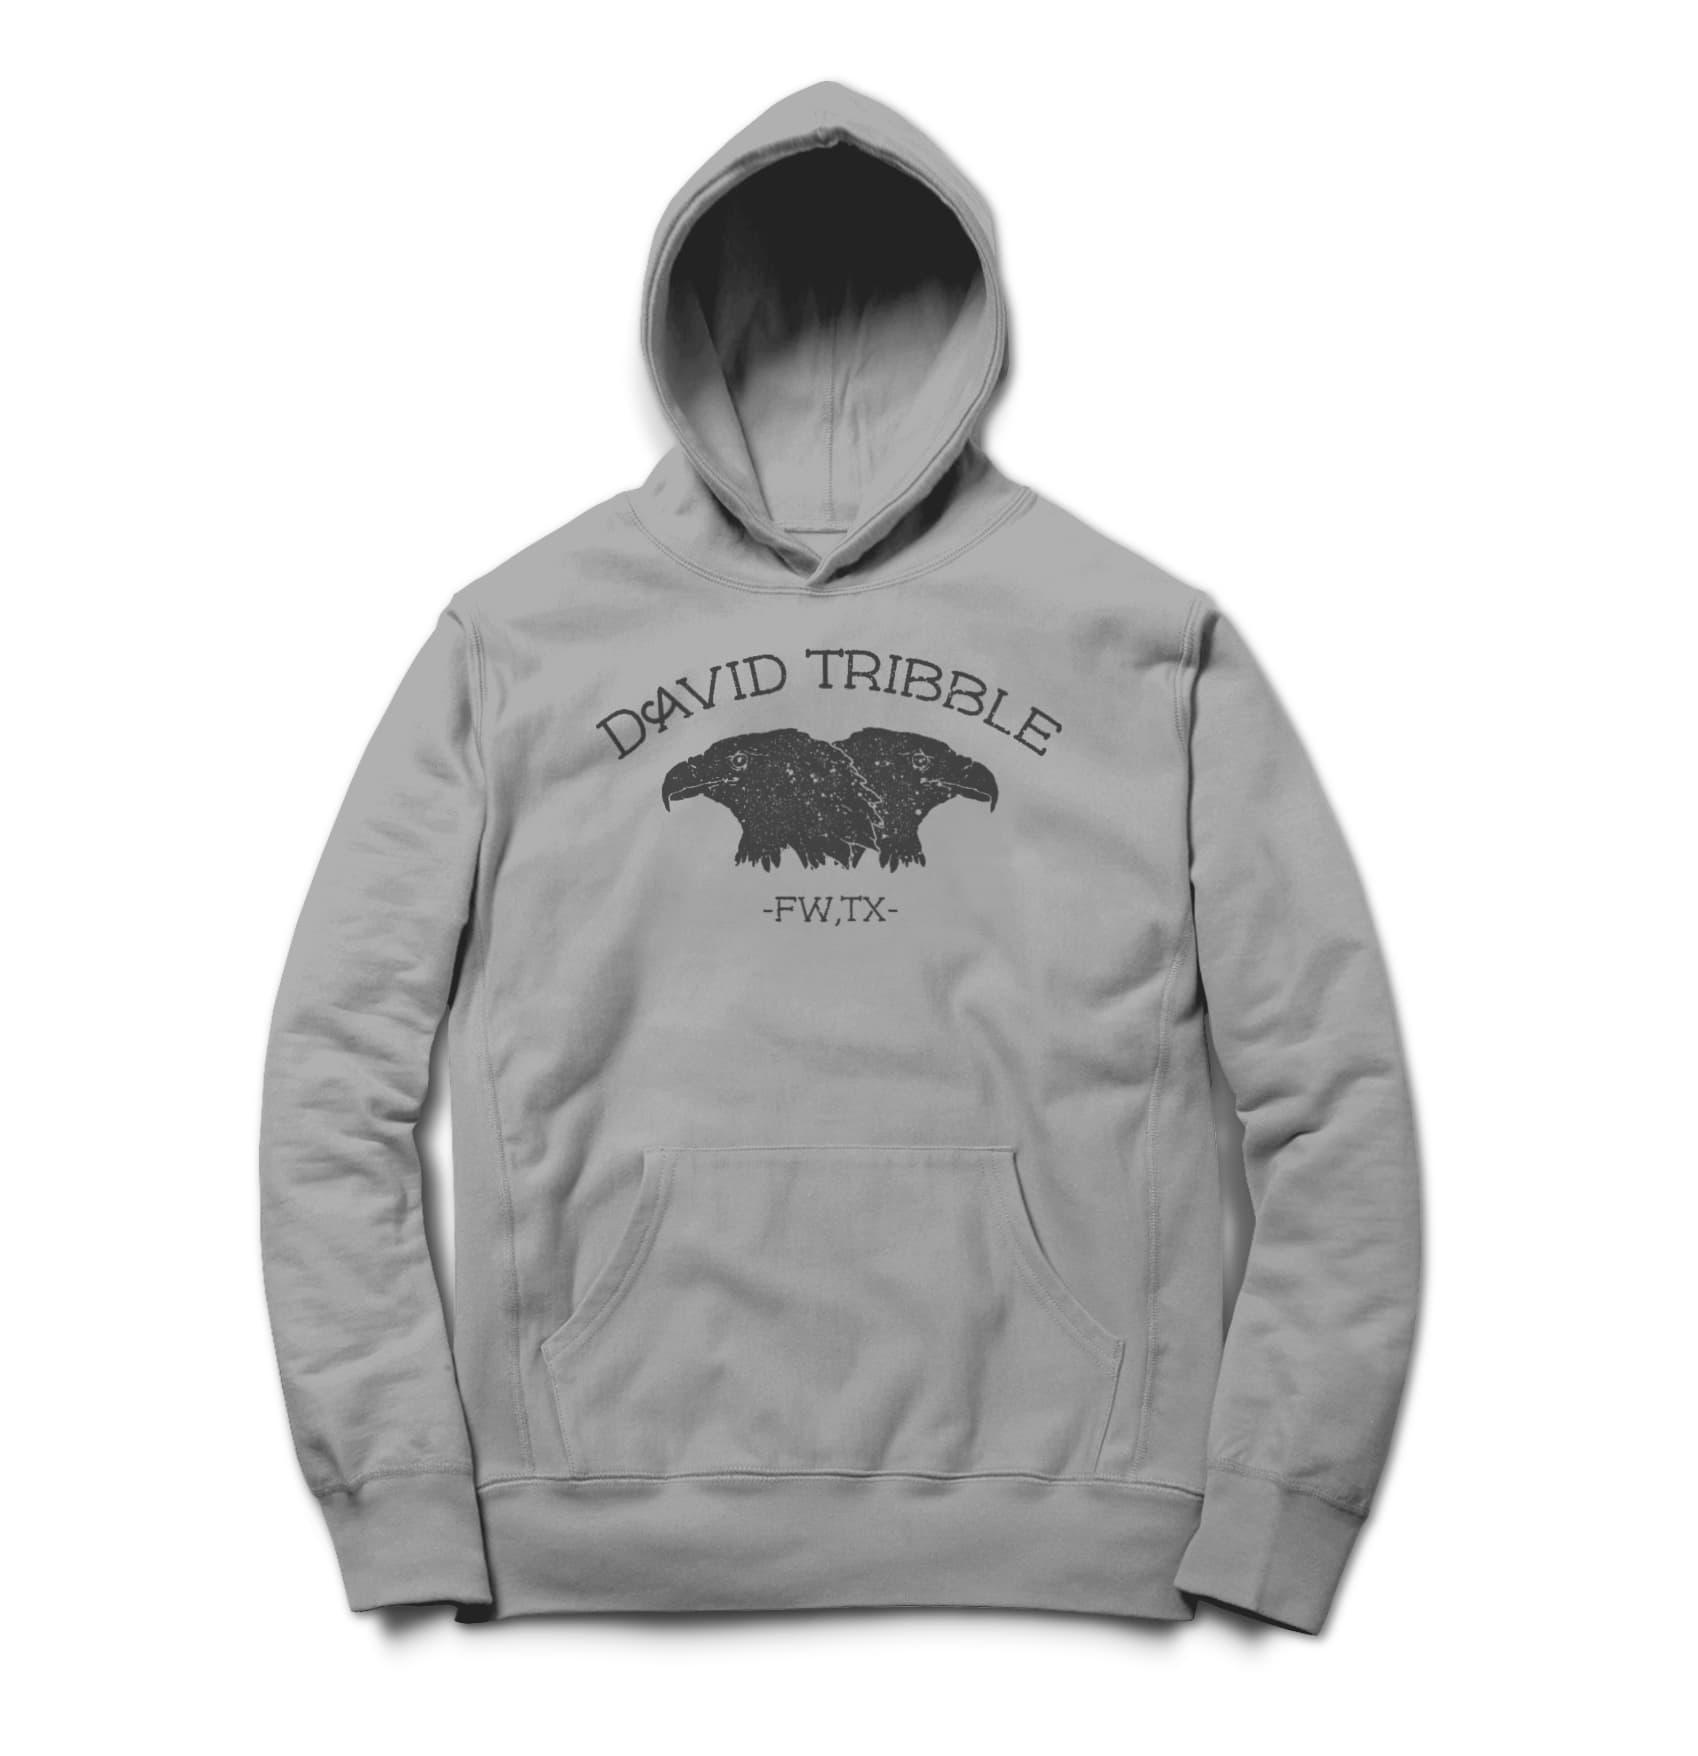 David tribble grey crow logo t fade 1531758865